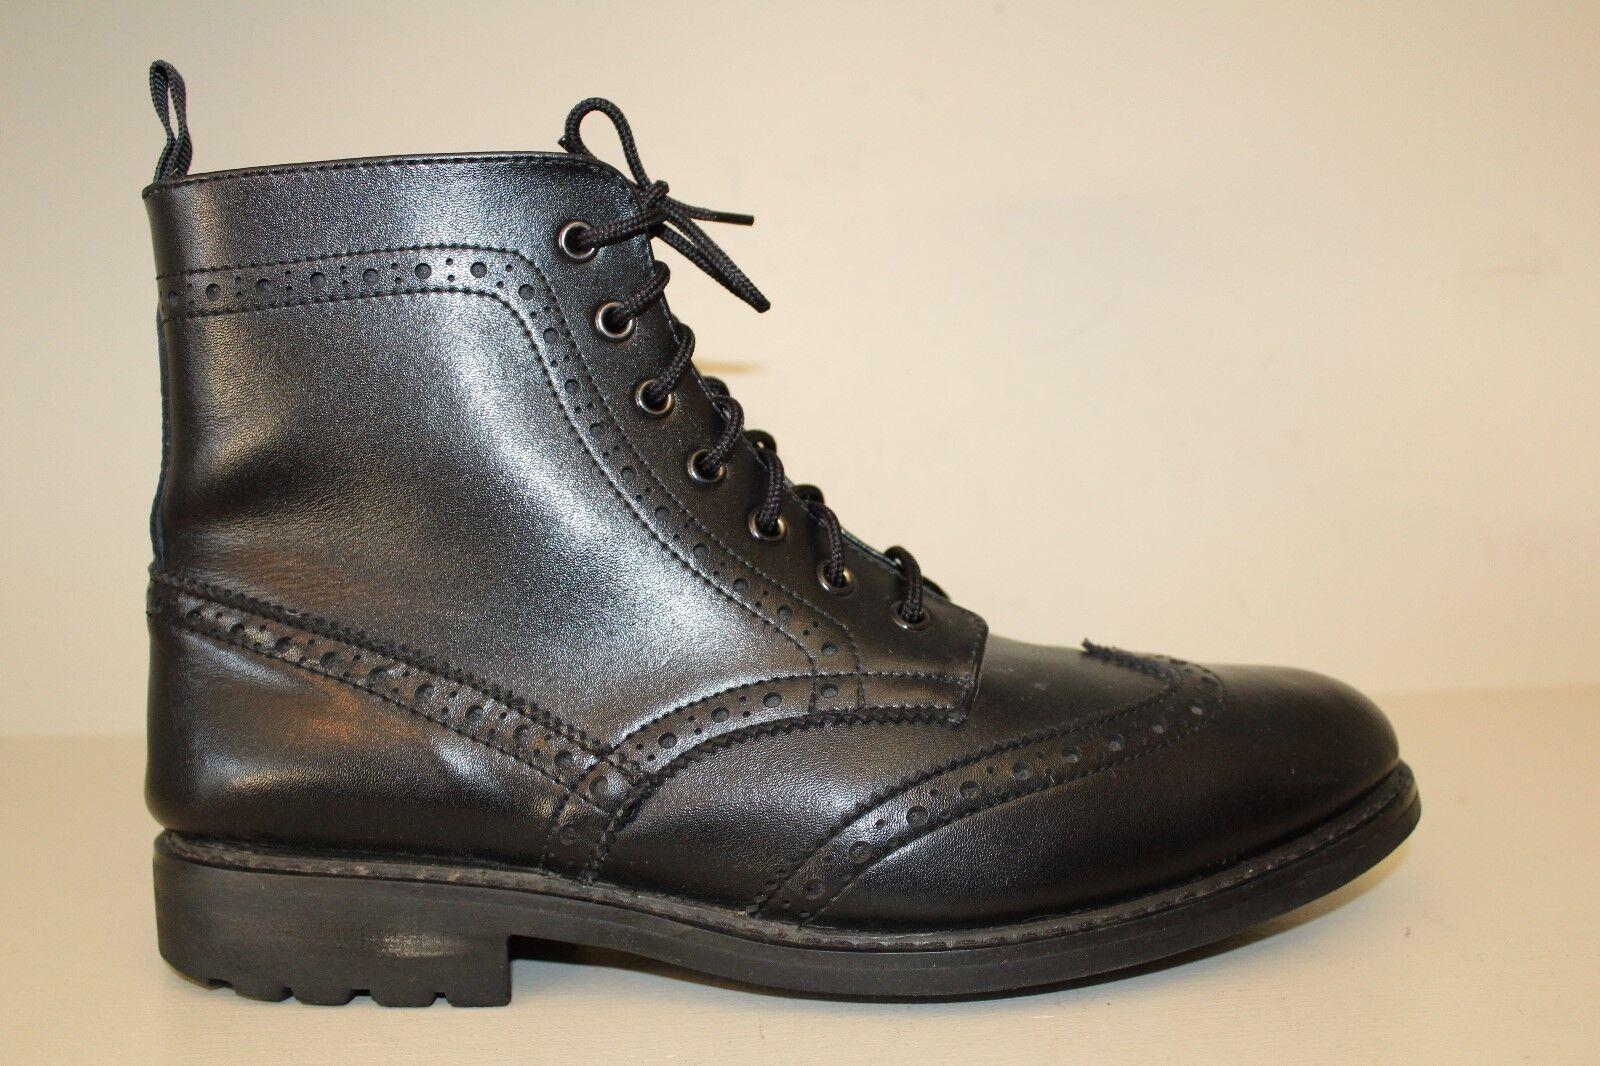 Joseph Abboud Mens Black Leather Wingtip Chukka Ankle Boots Lace Up Shoe Sz 12